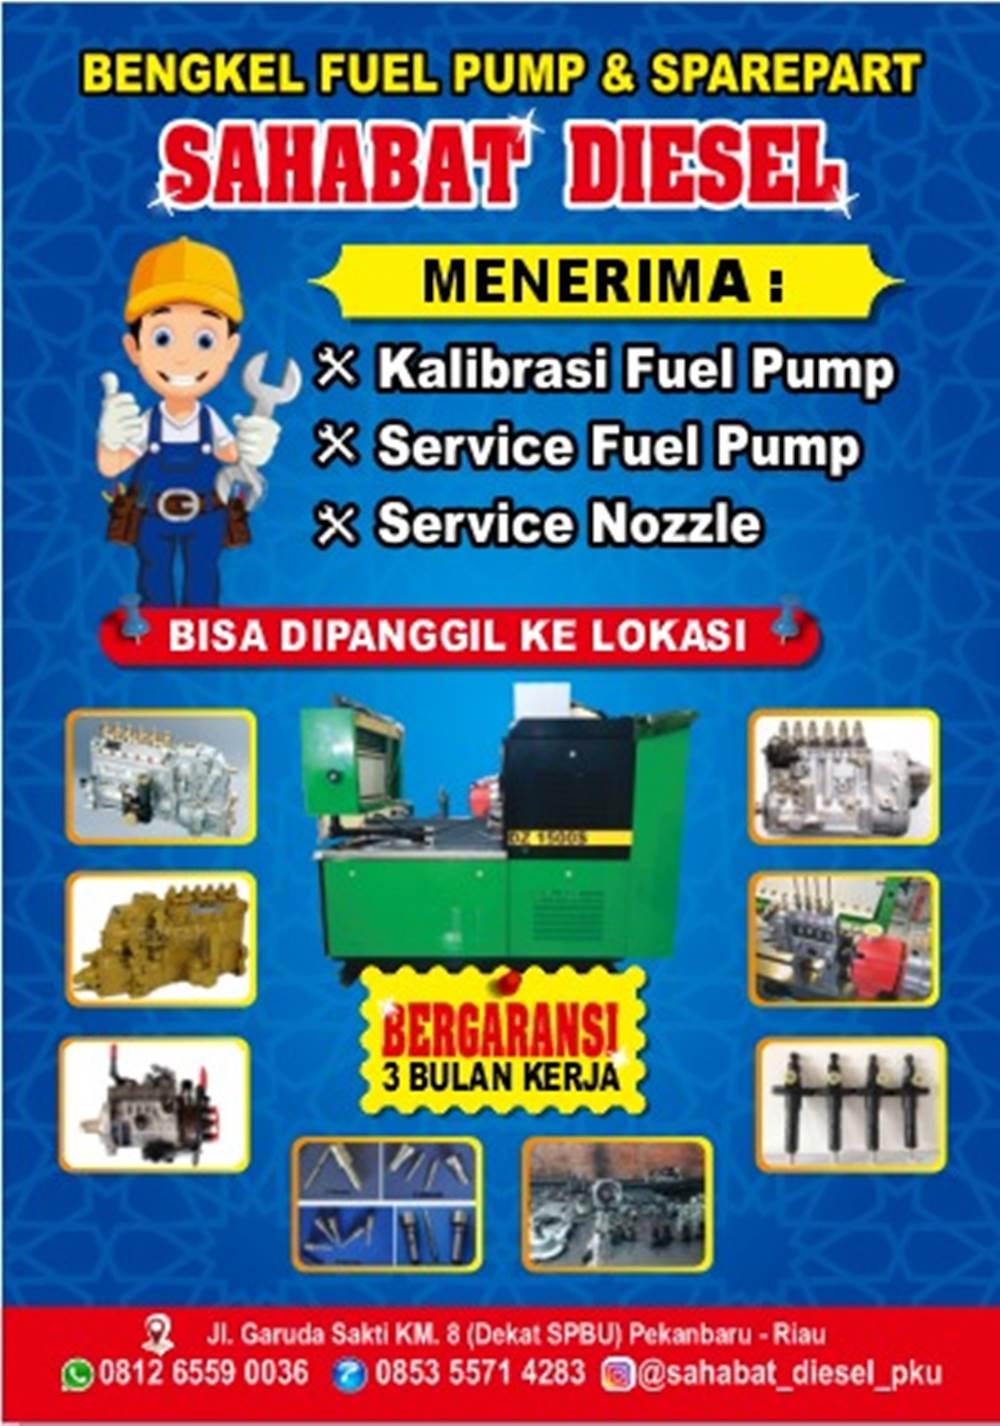 Sahabat Diesel Pekanbaru 5 - Sahabat Diesel Pekanbaru